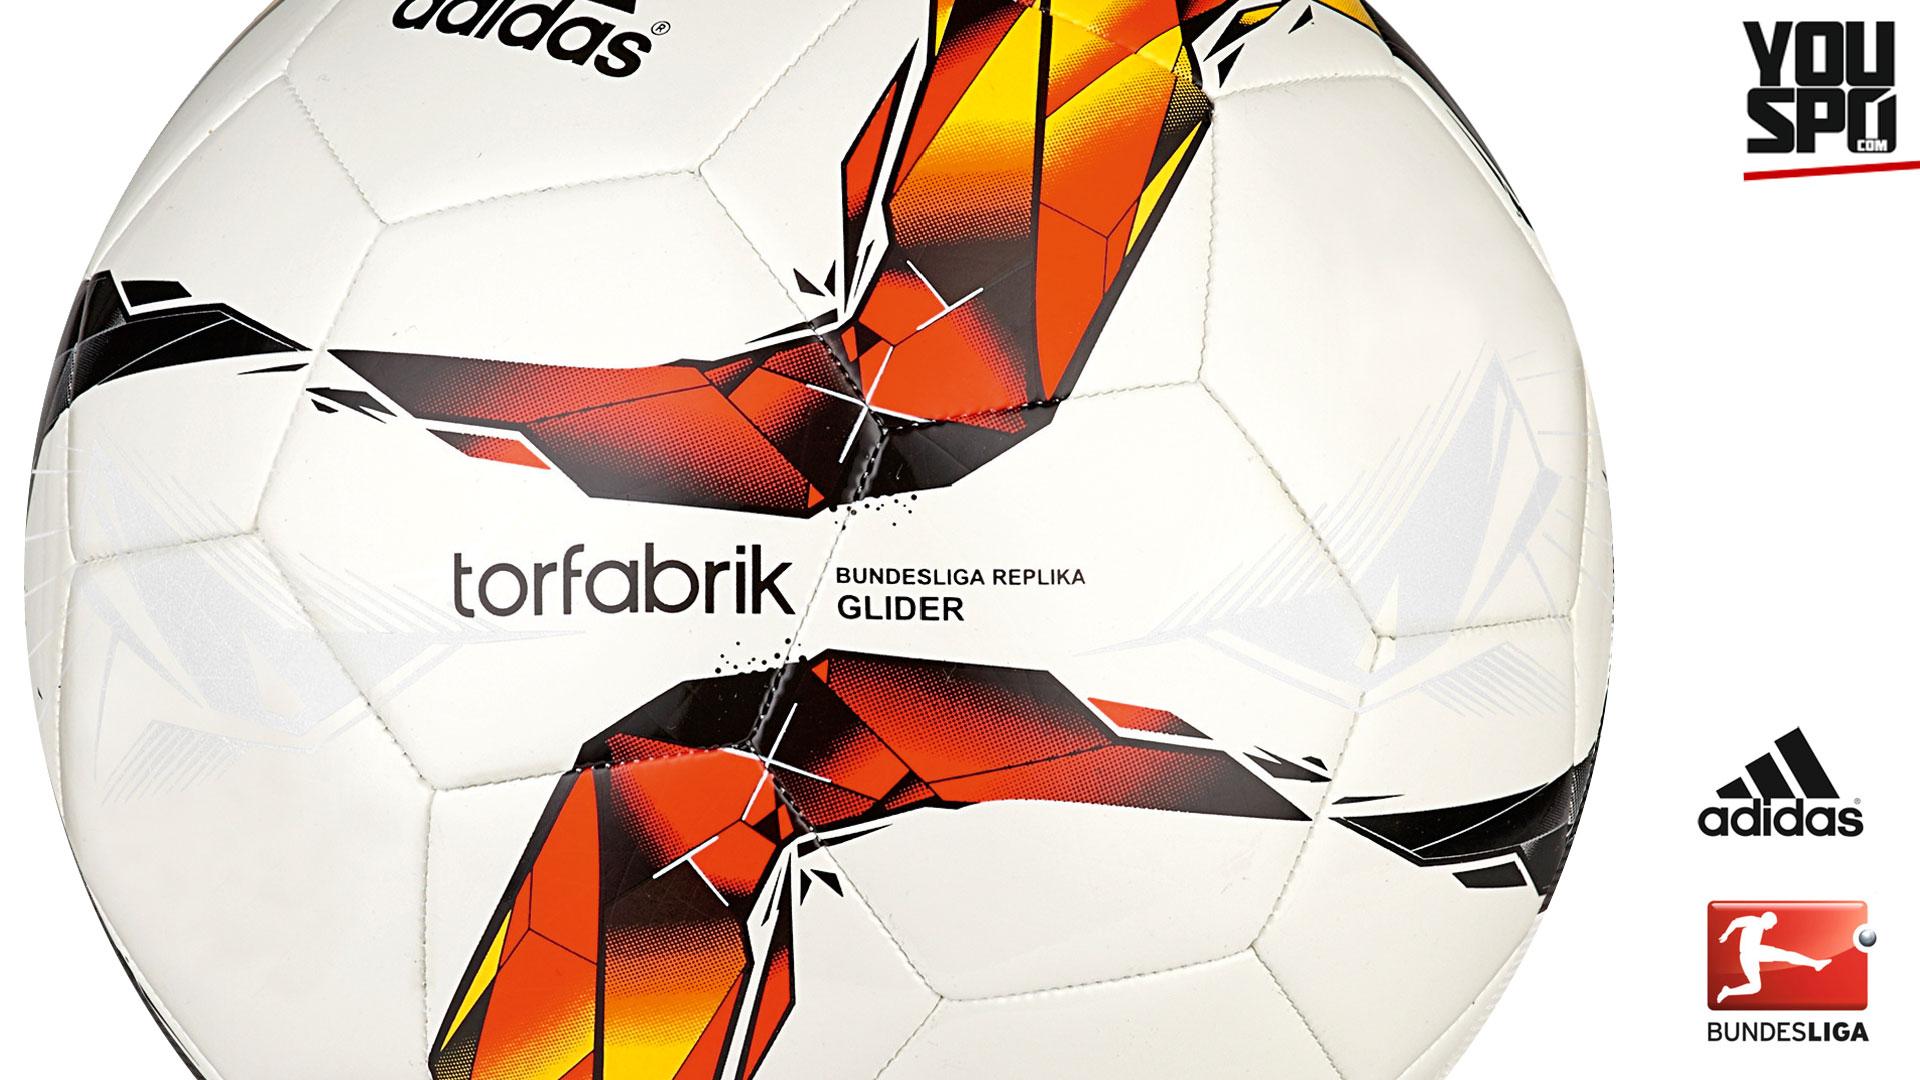 Adidas Torfarbik 15/16 Glider  (2015-2016)